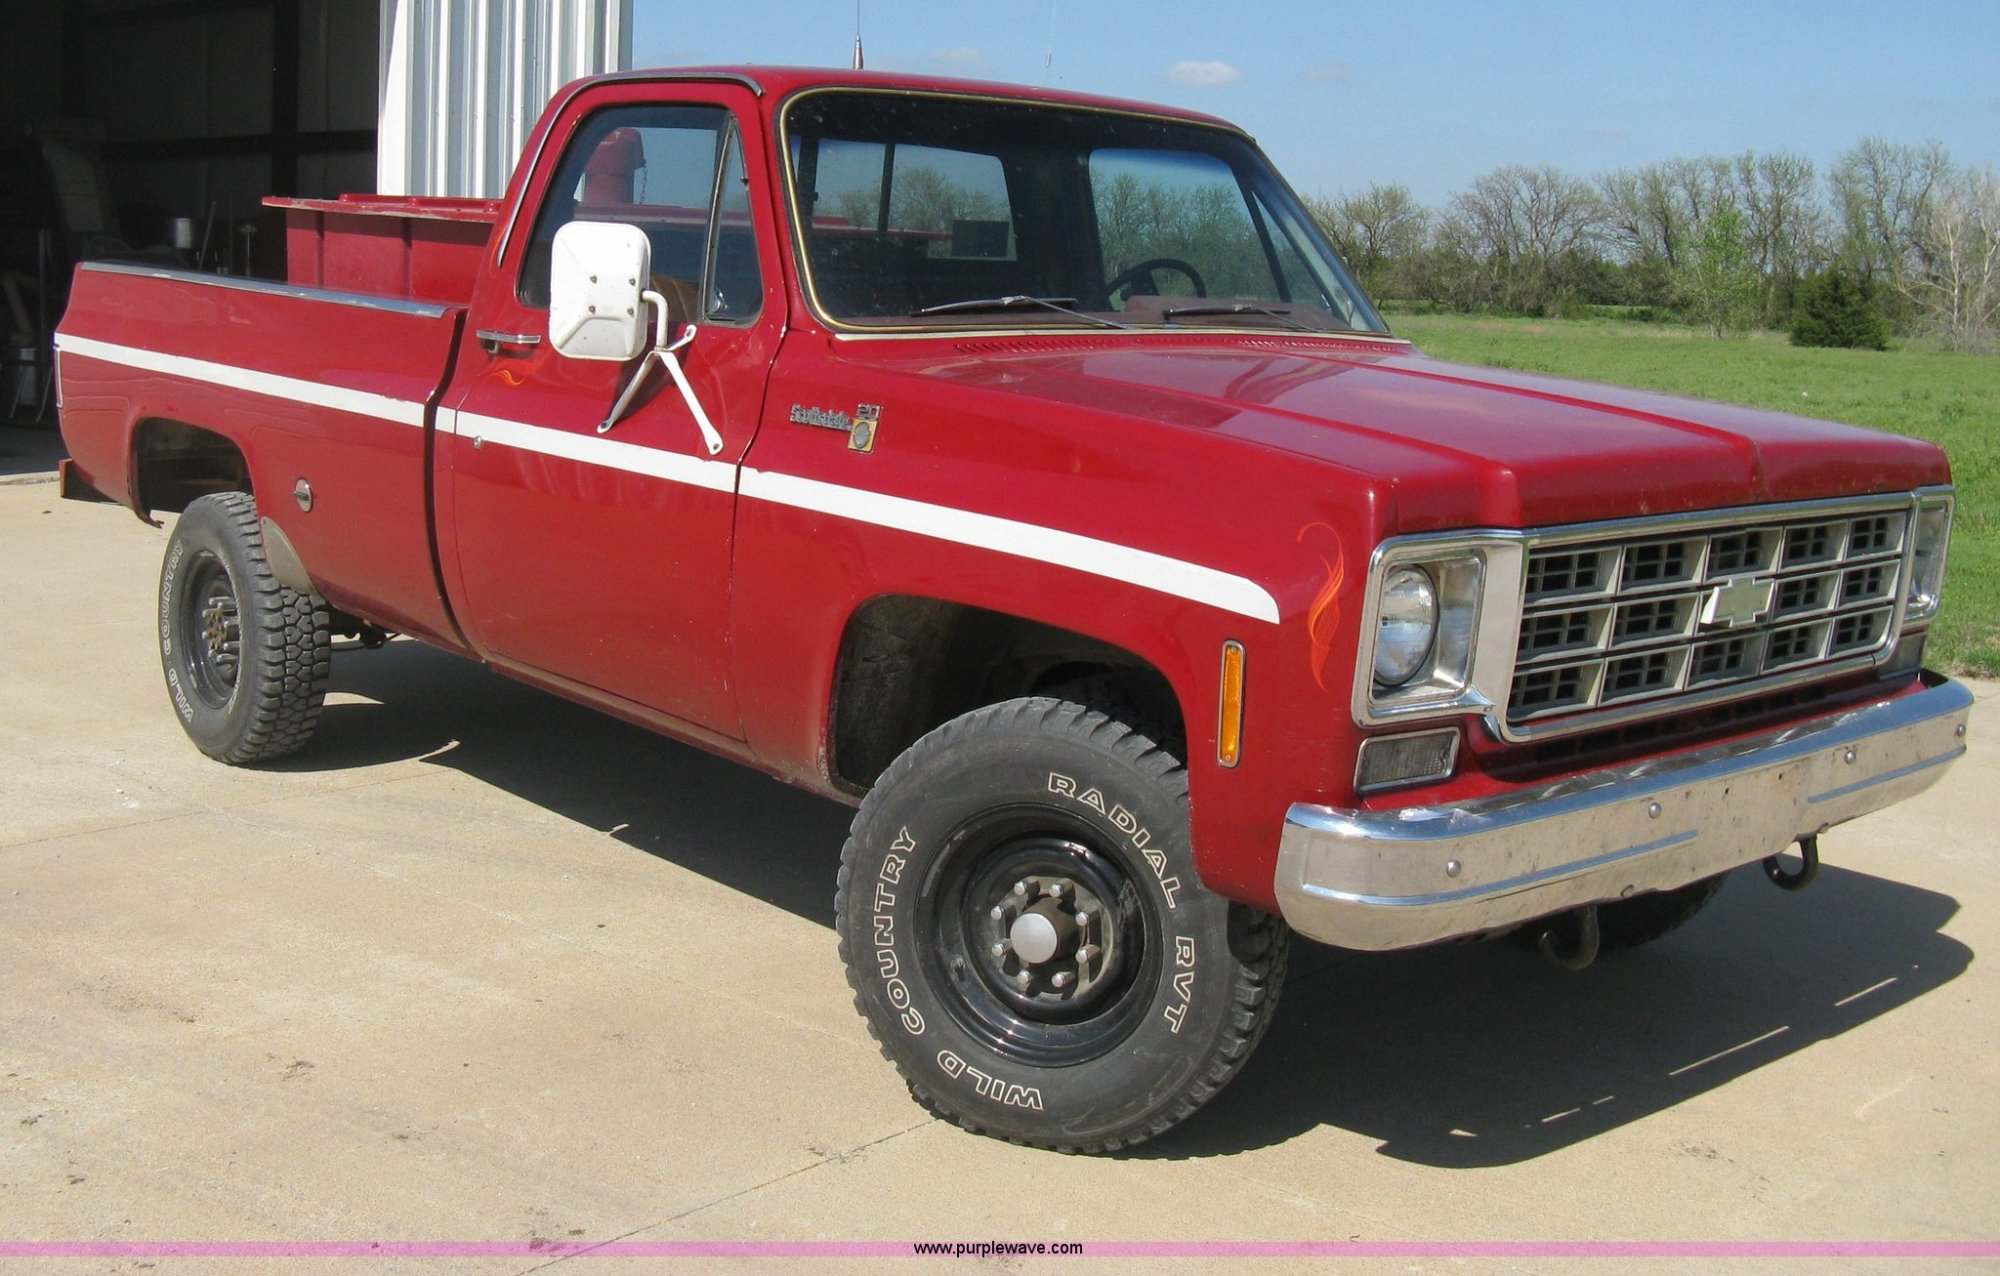 hight resolution of d8313 image for item d8313 1978 chevrolet scottsdale 20 pickup truck